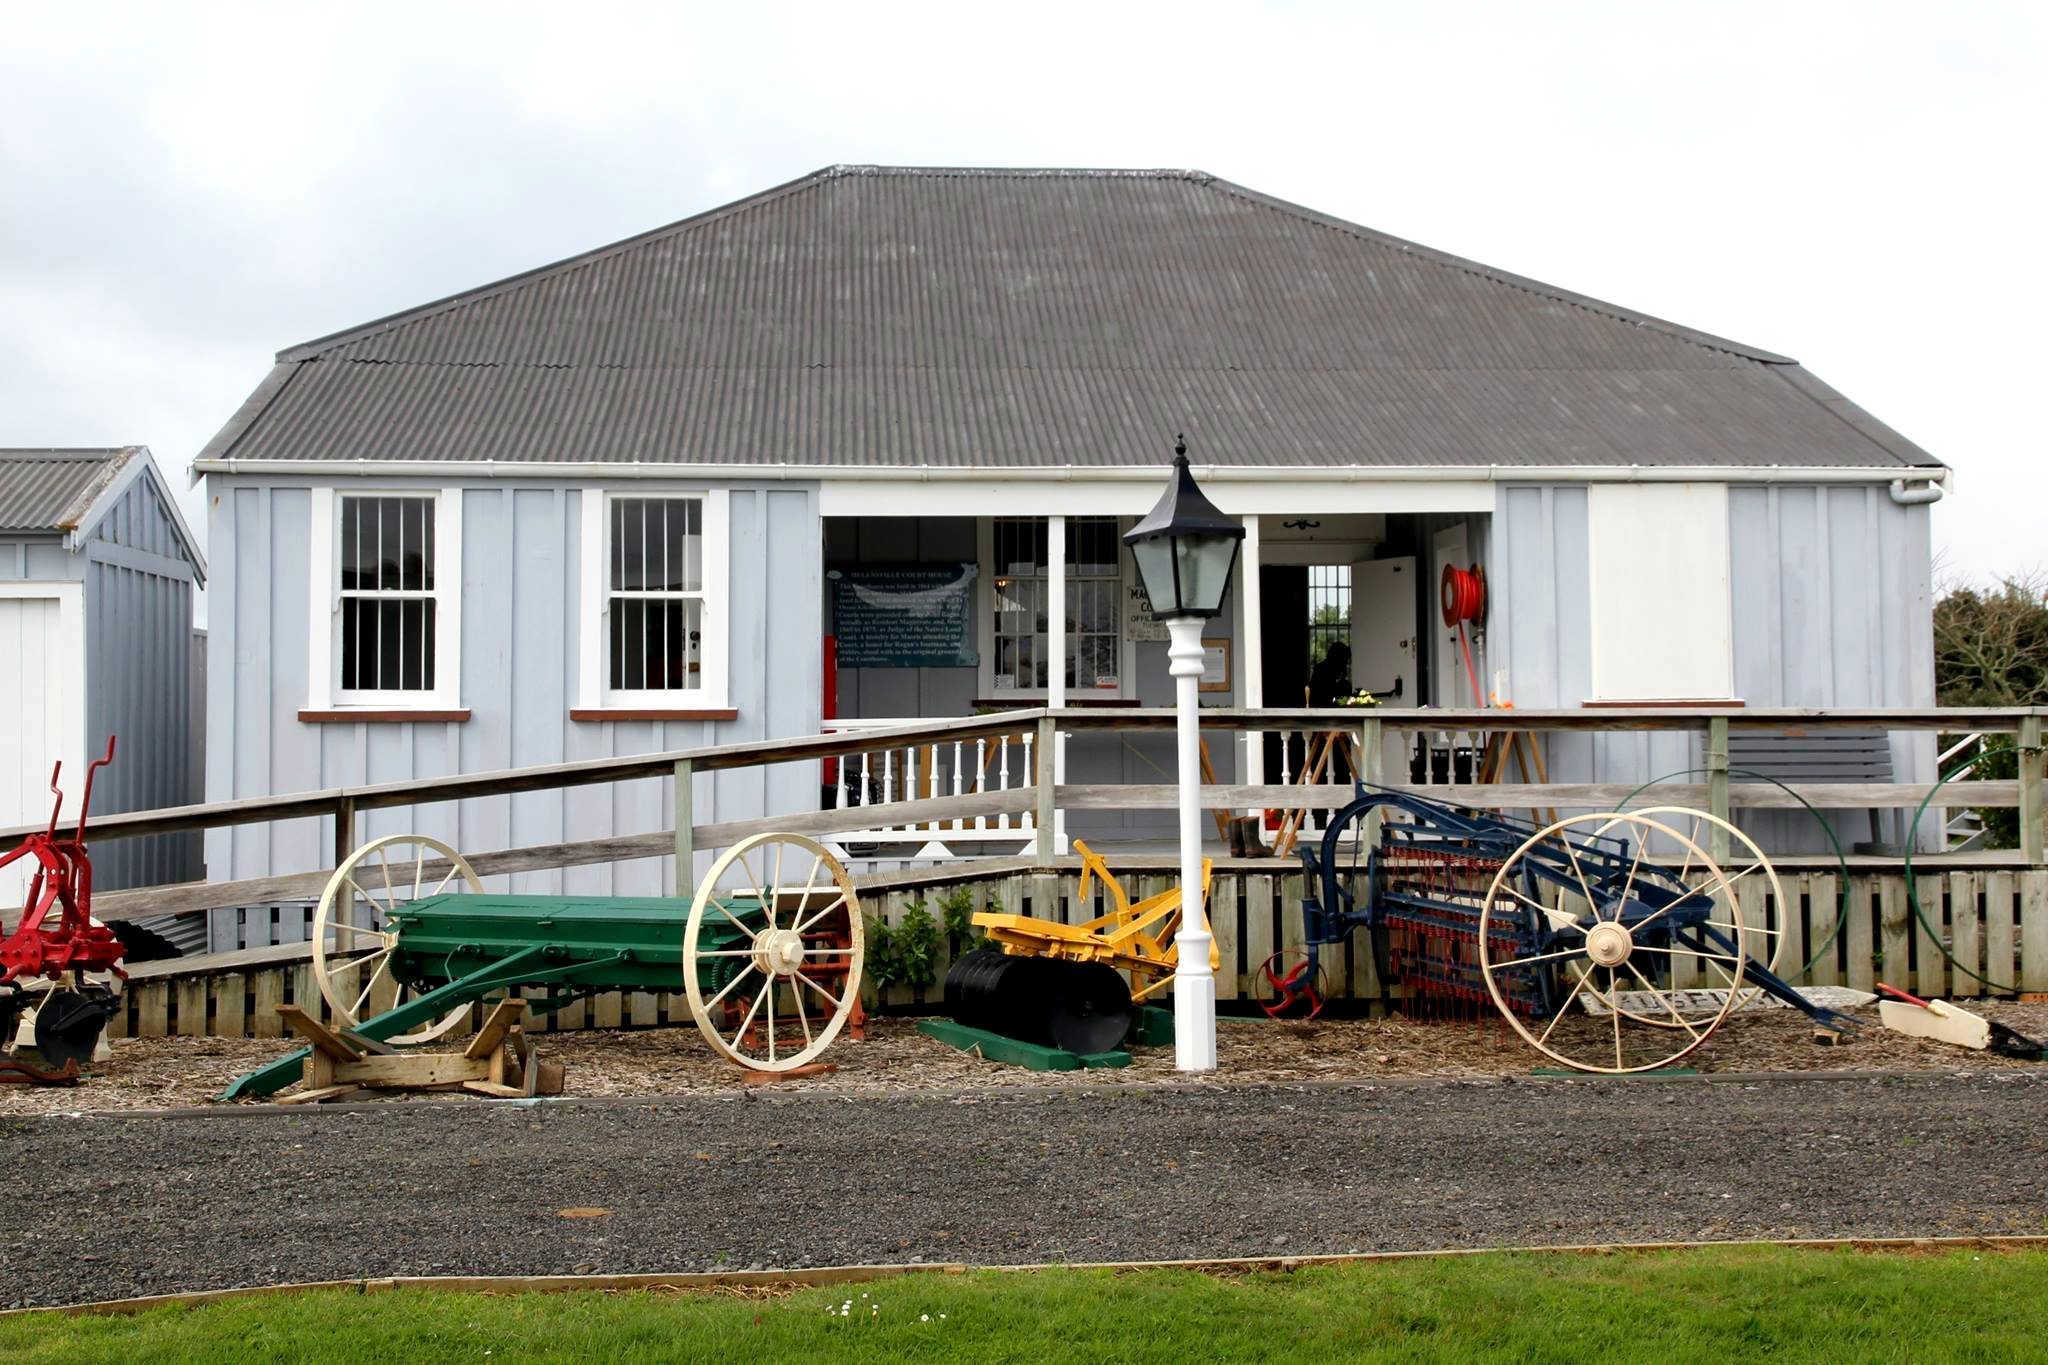 Helensville Museum, Auckland, New Zealand @Helensville Museum